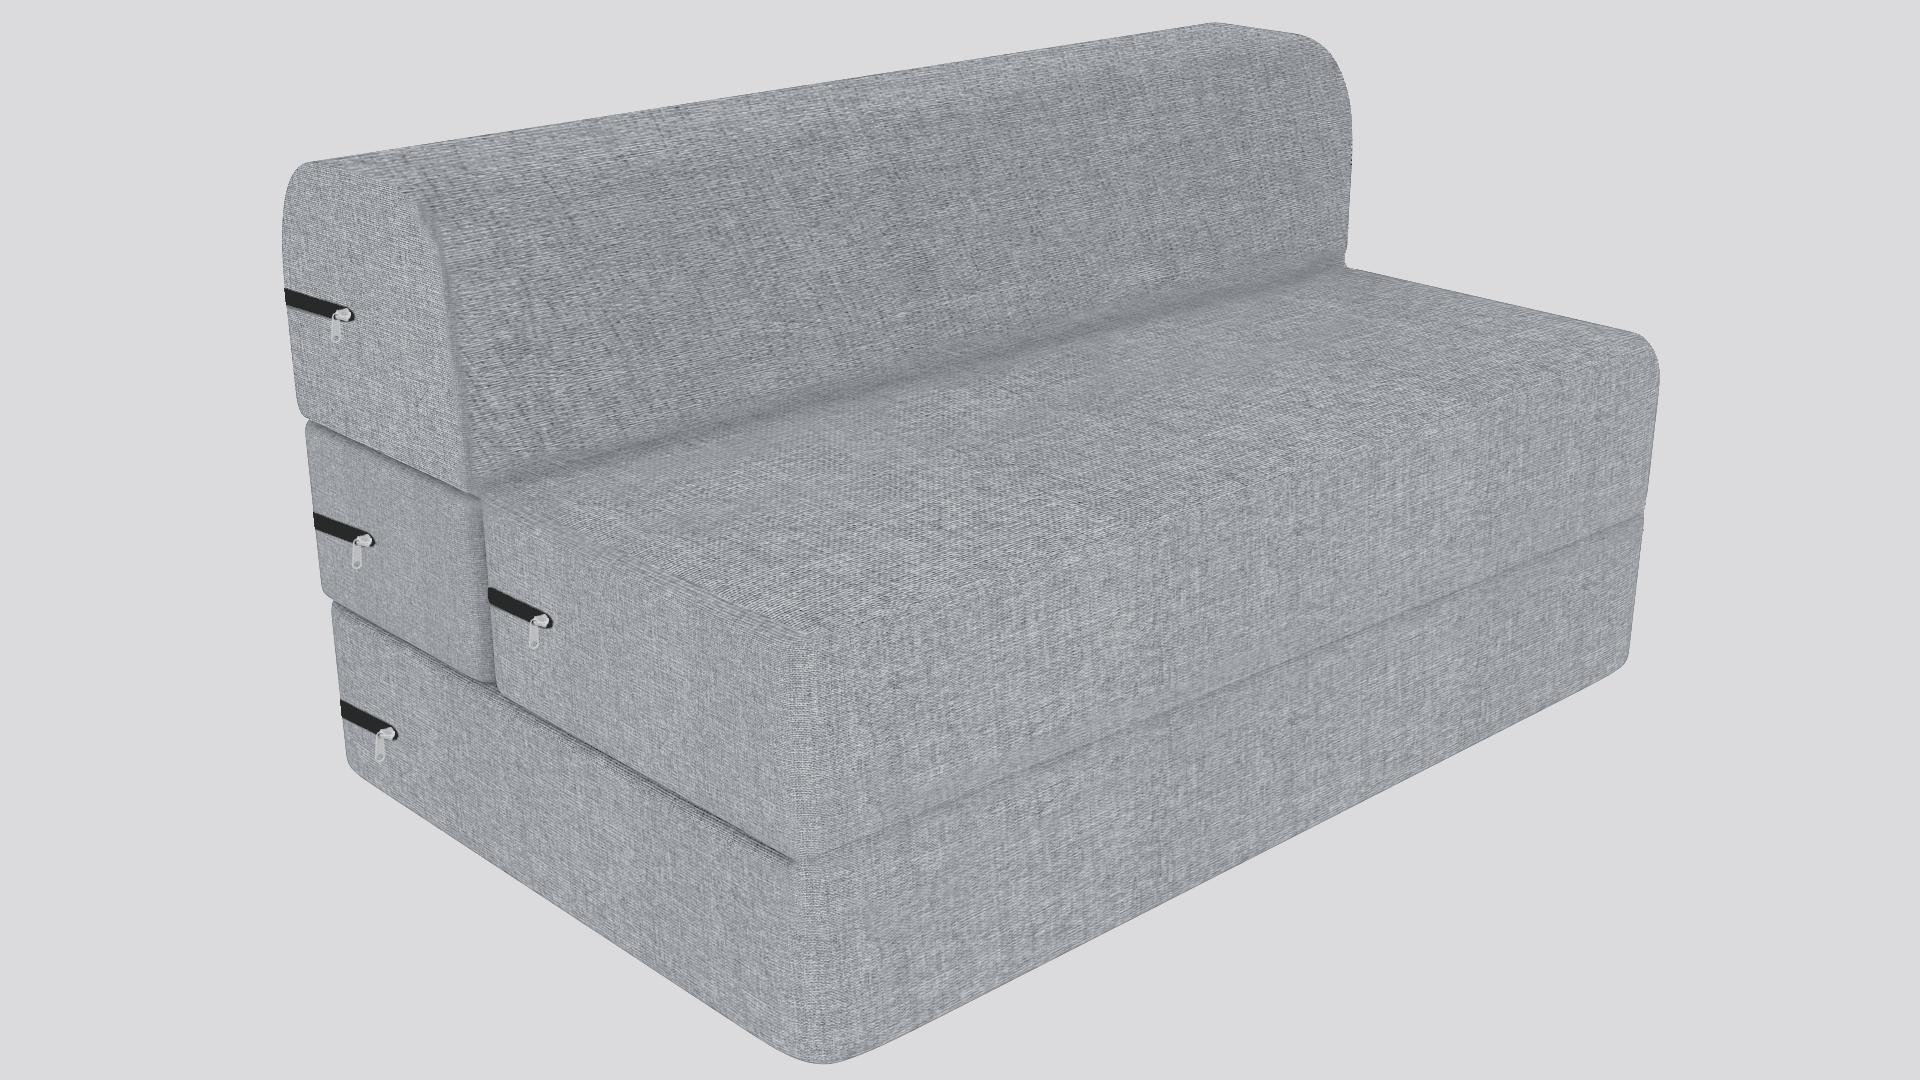 Hospital sofa